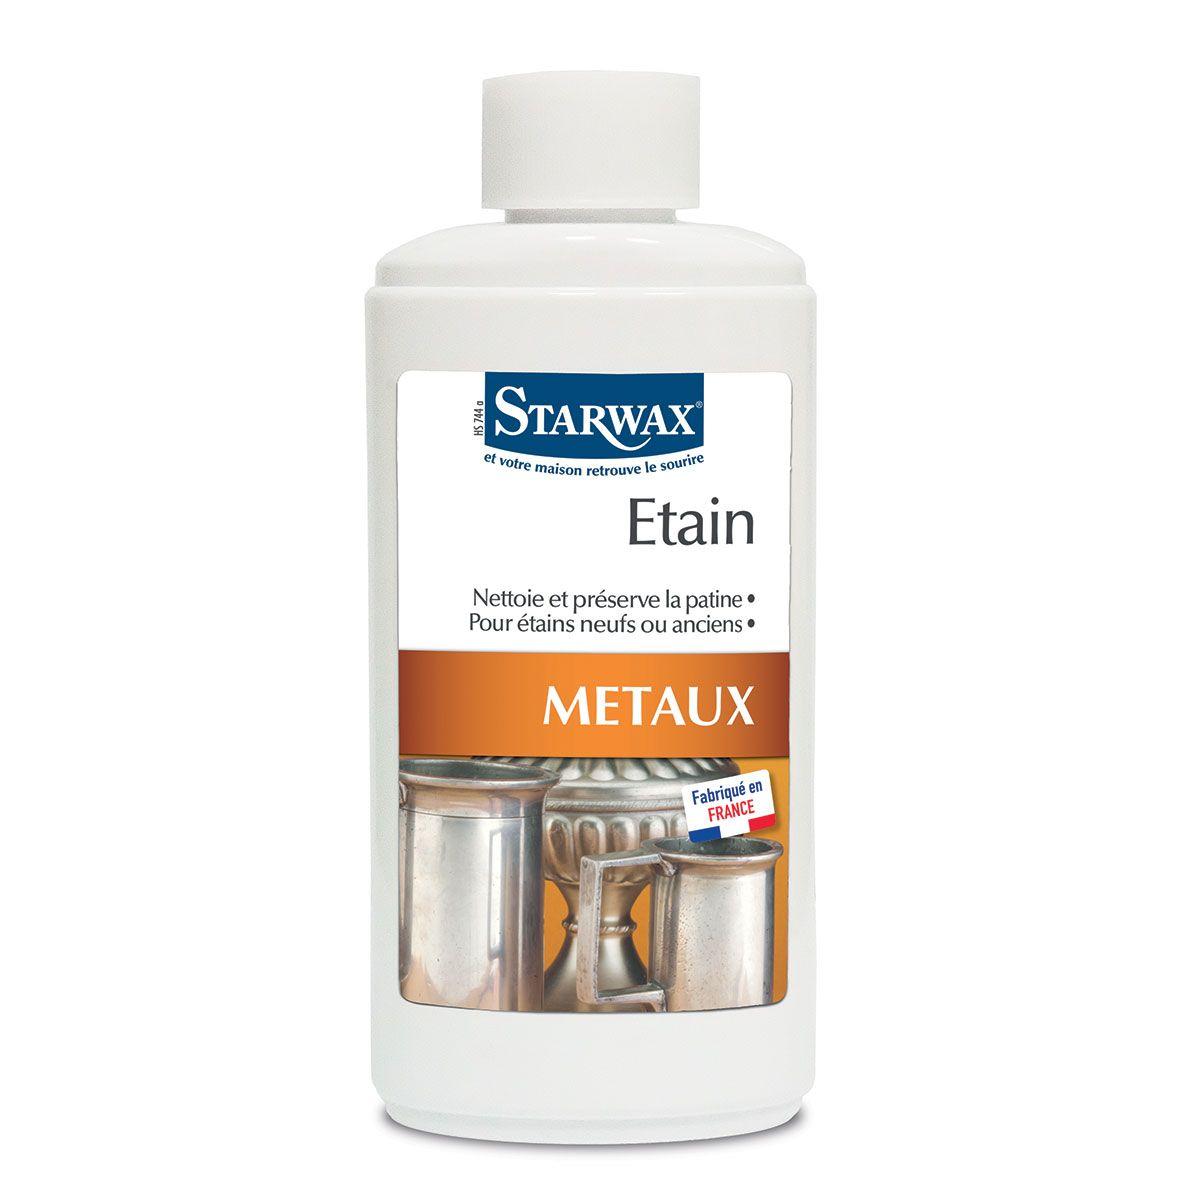 nettoyant etain métaux starwax